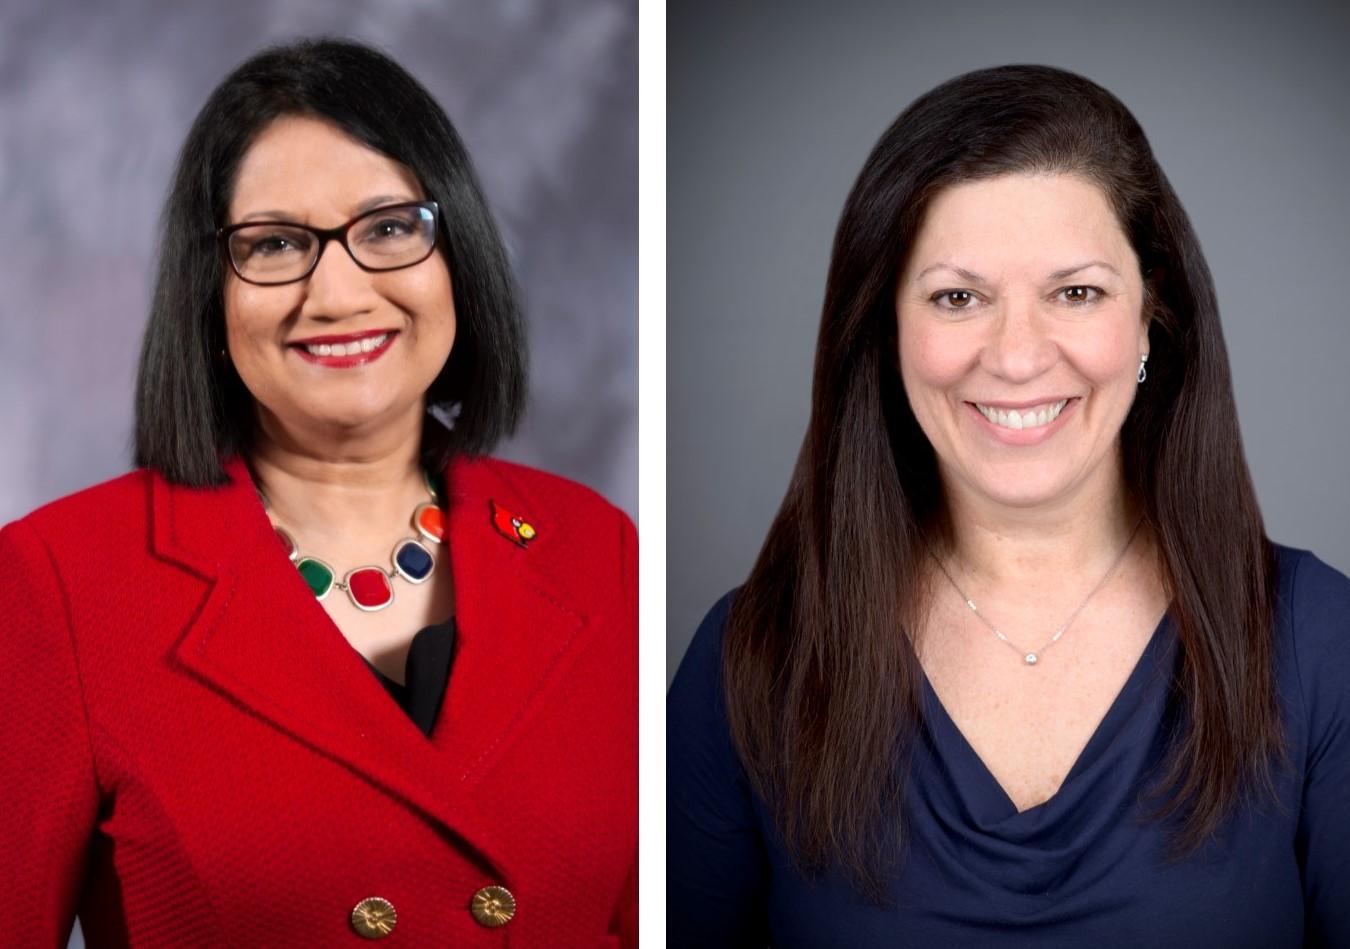 University of Louisville, Norton Healthcare finalize pediatric integration